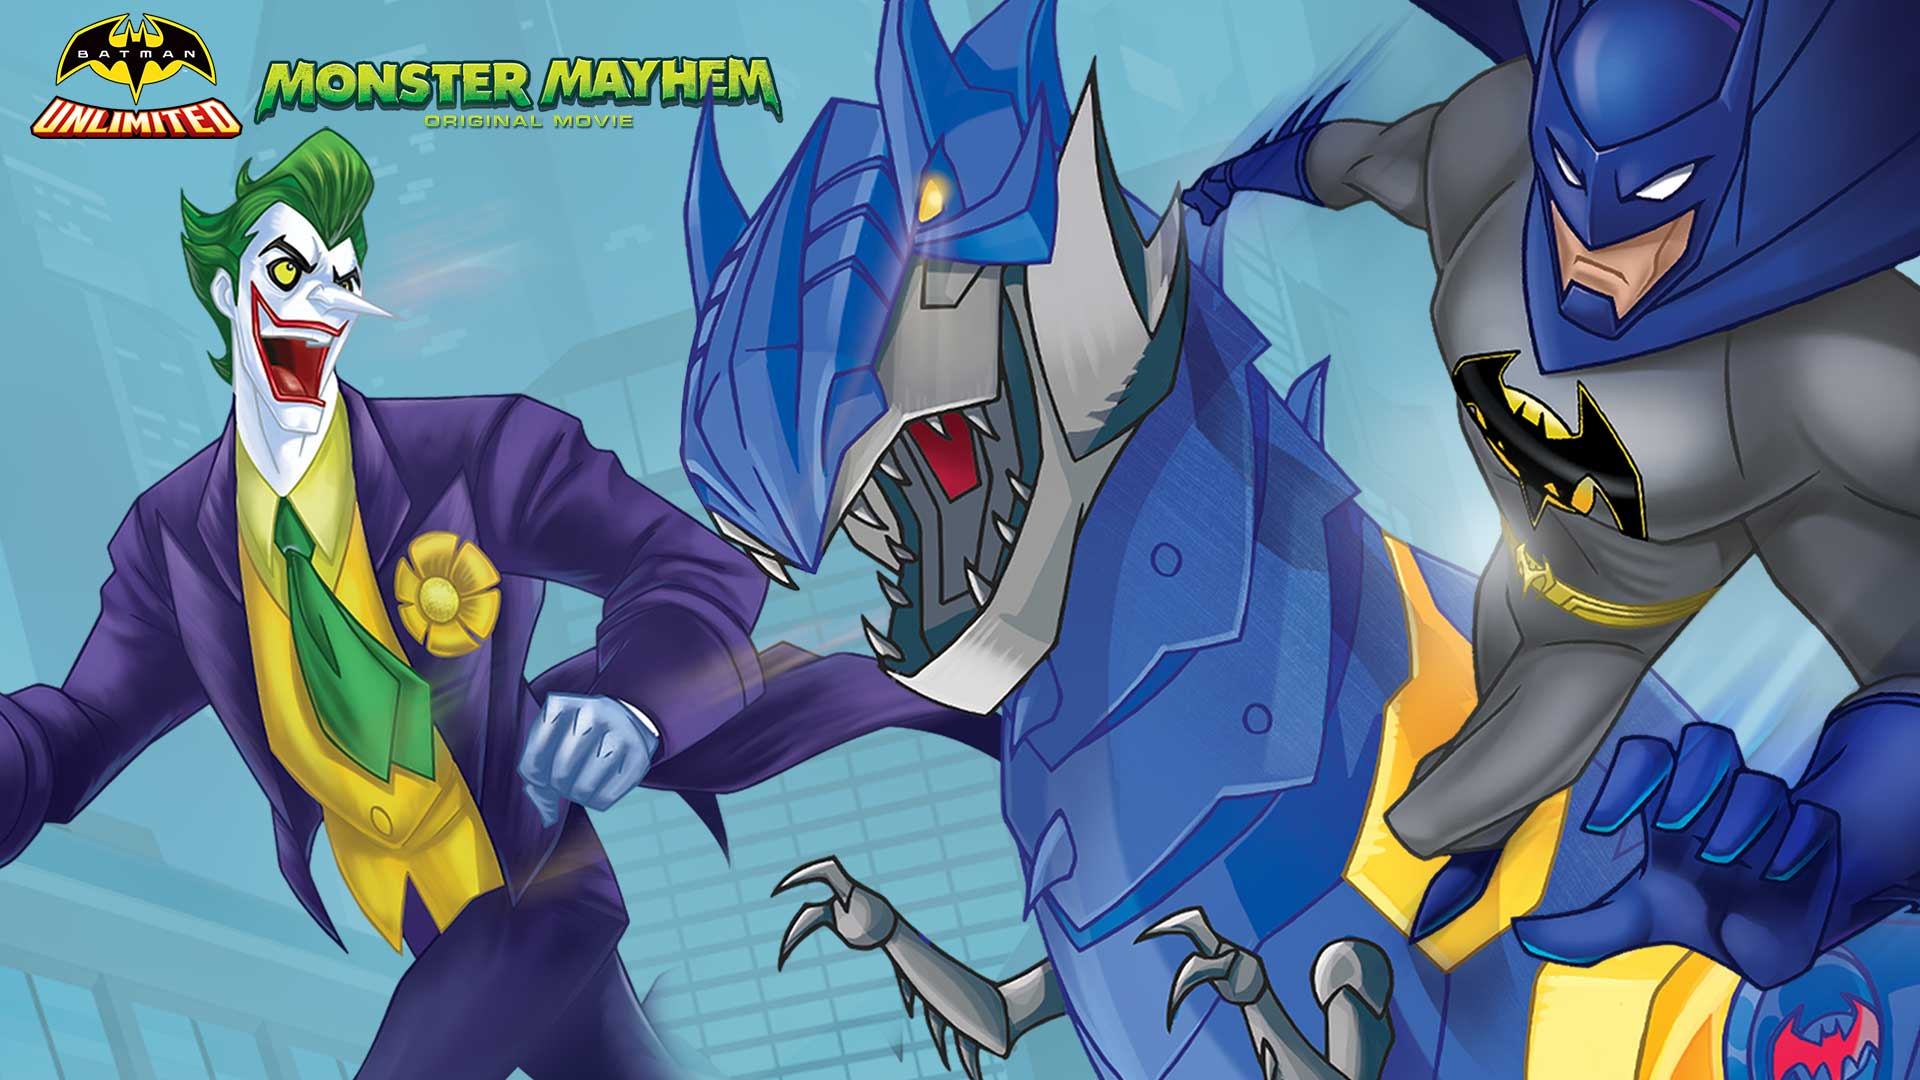 High Resolution Wallpaper | Batman Unlimited: Monster Mayhem 1920x1080 px